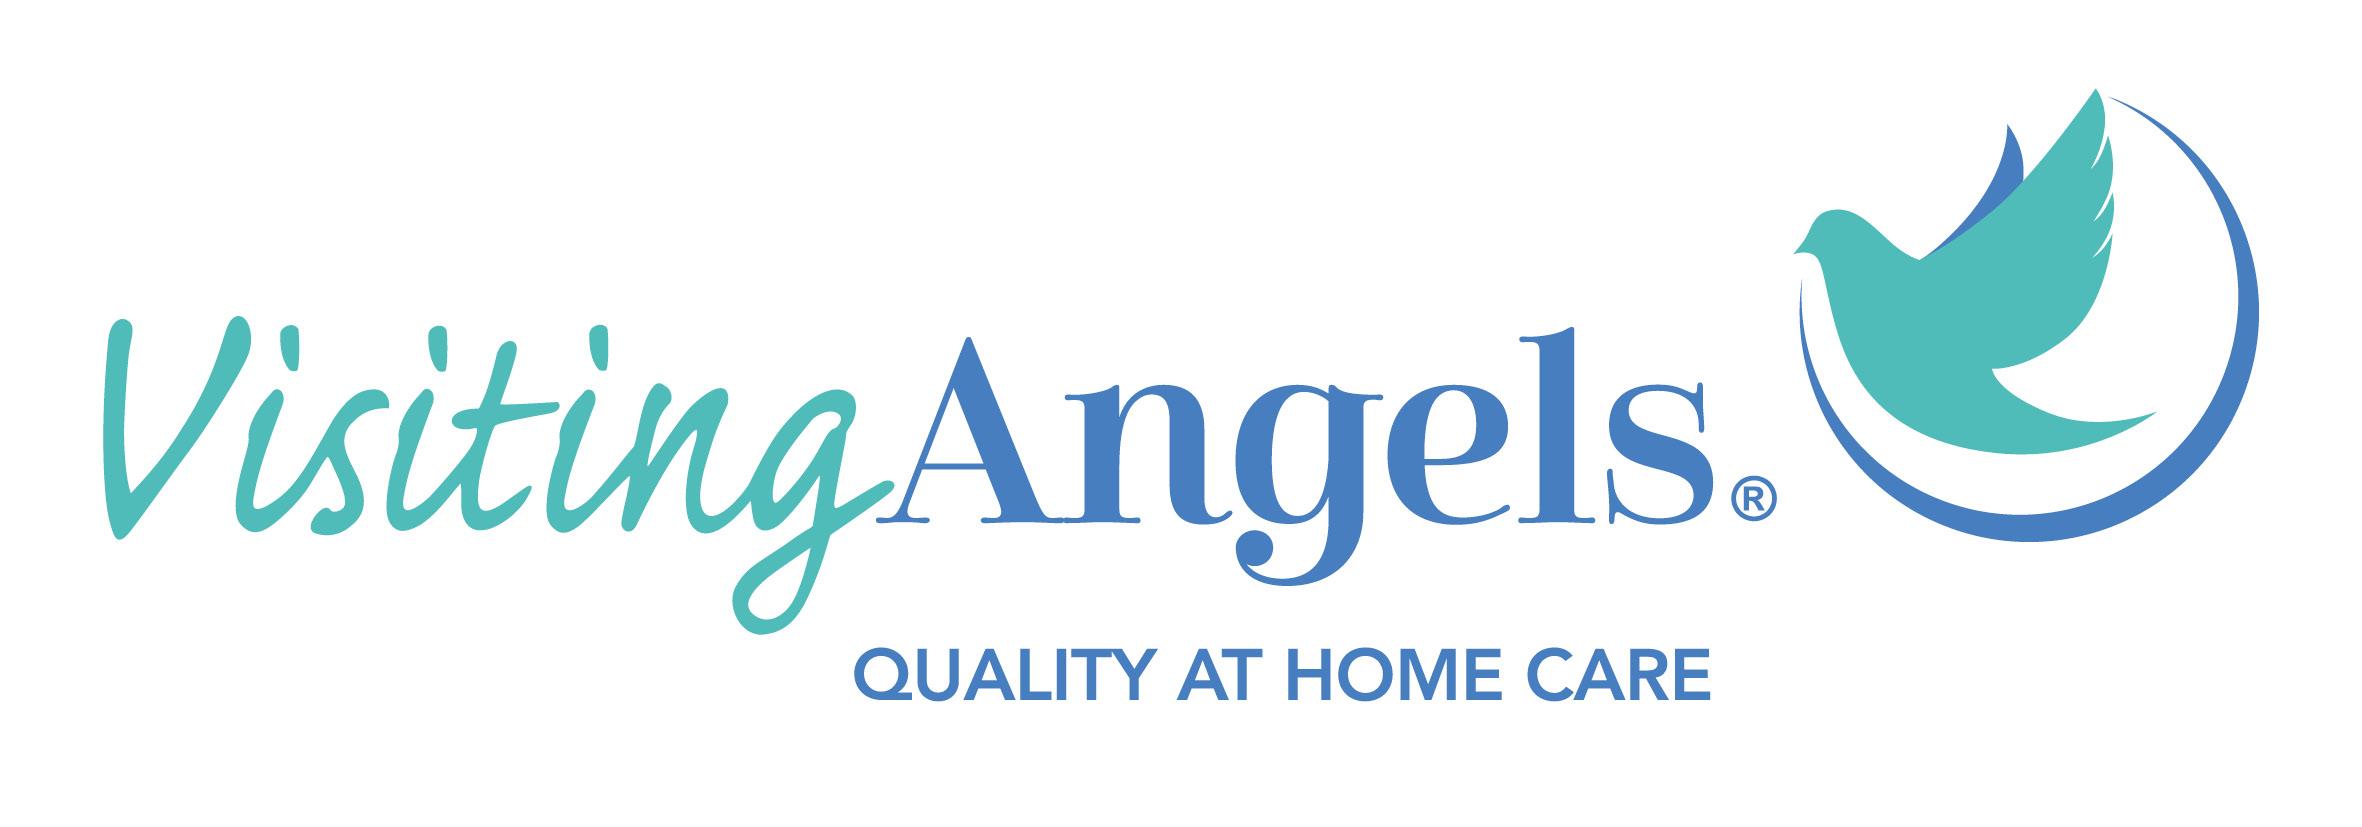 Visiting Angels Cambridgeshire